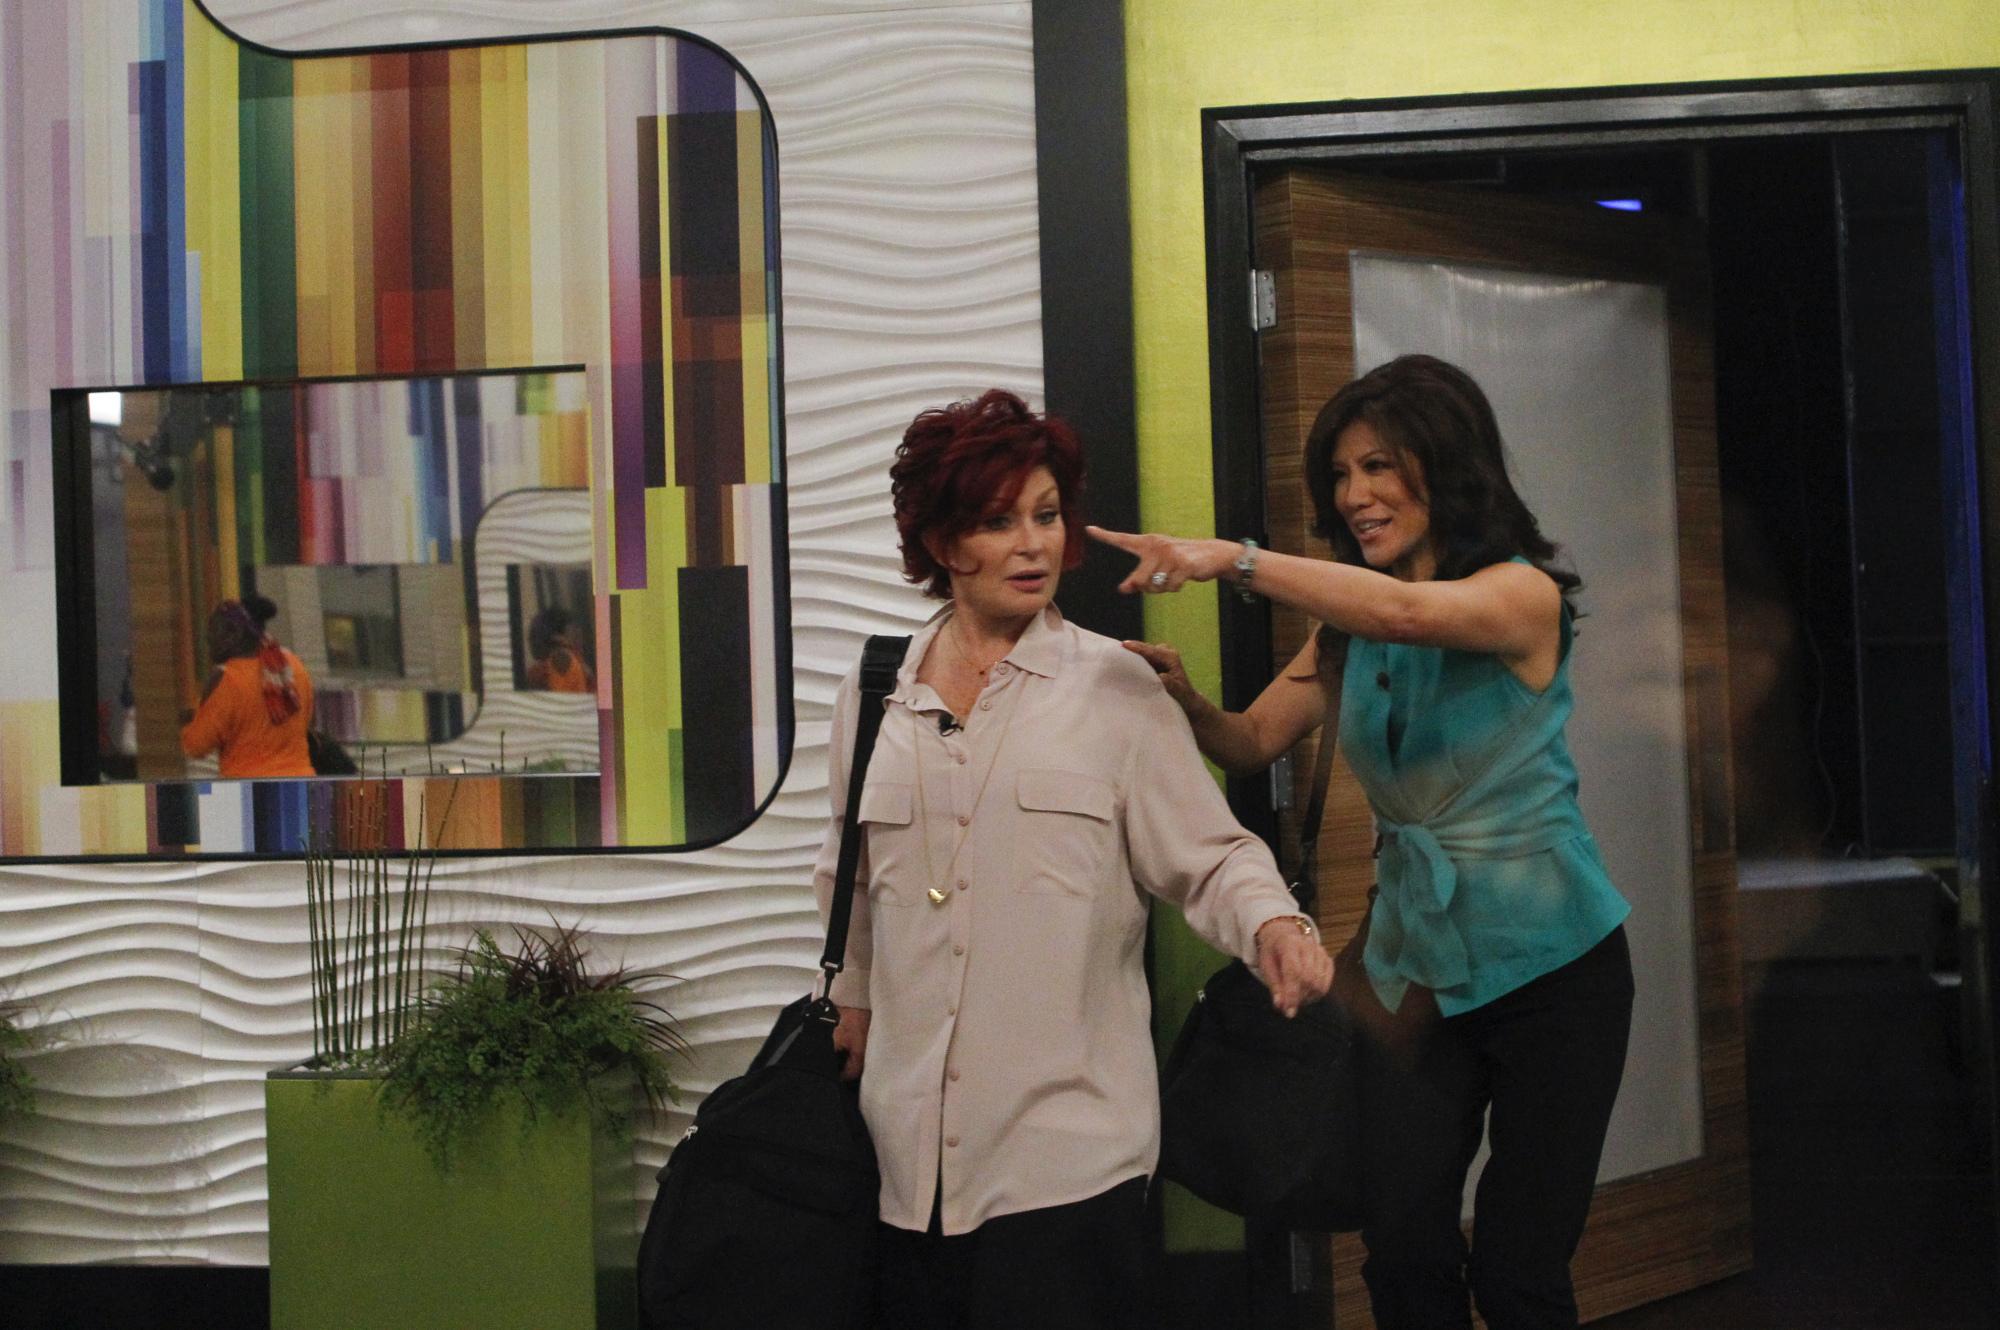 Sharon and Julie